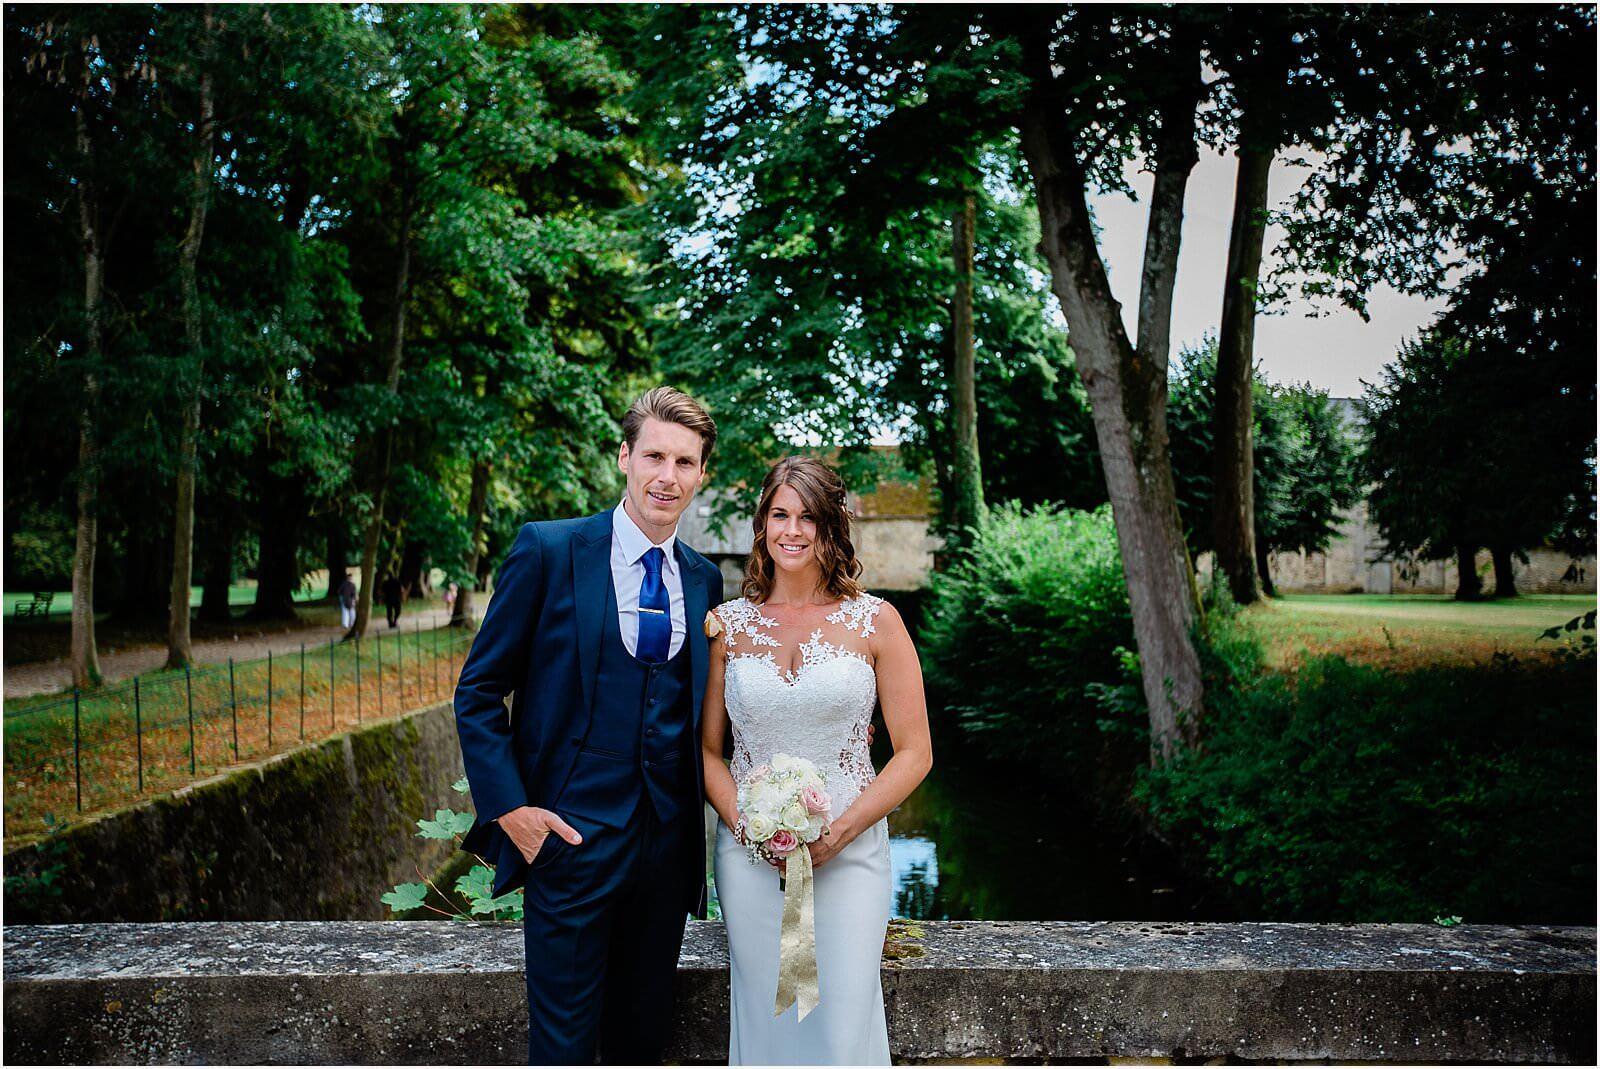 Chateau de Courtomer Wedding | Chantel & Evan 39